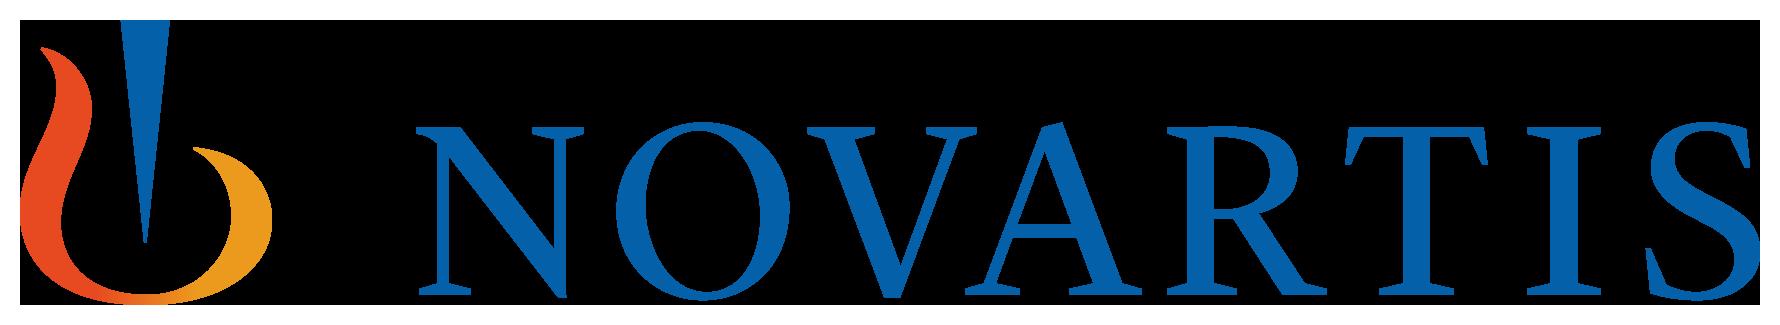 Novartis Healthcare Pvt Ltd logo - JFH